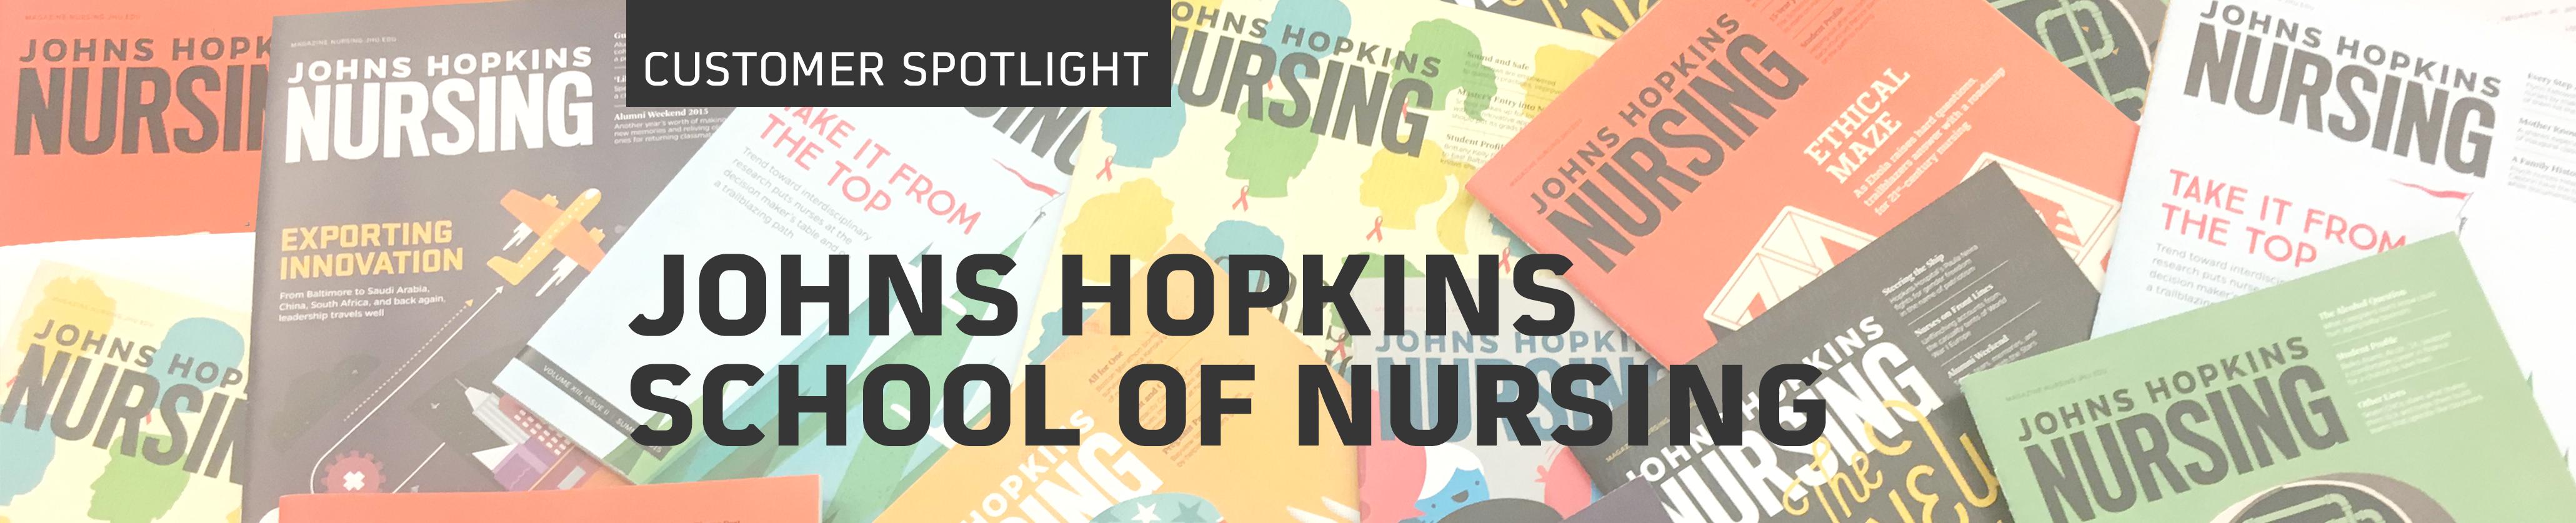 SONvitals - nursing.johnshopkins.edu